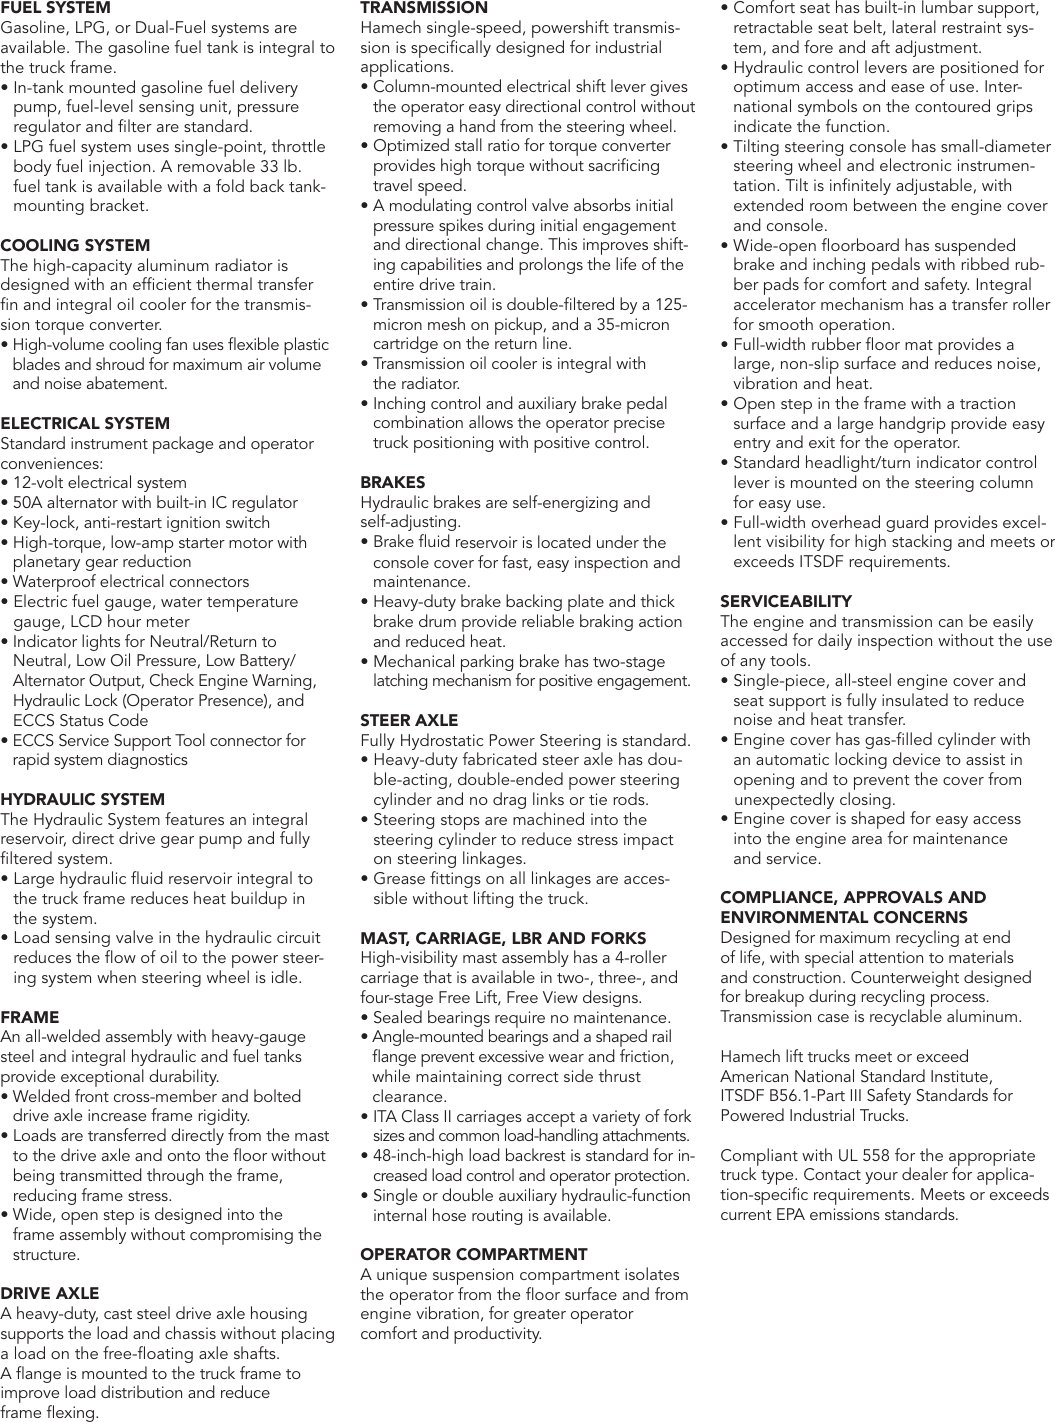 Crown Equipment Cushion Tire Lift Trucks Max50 Users Manual